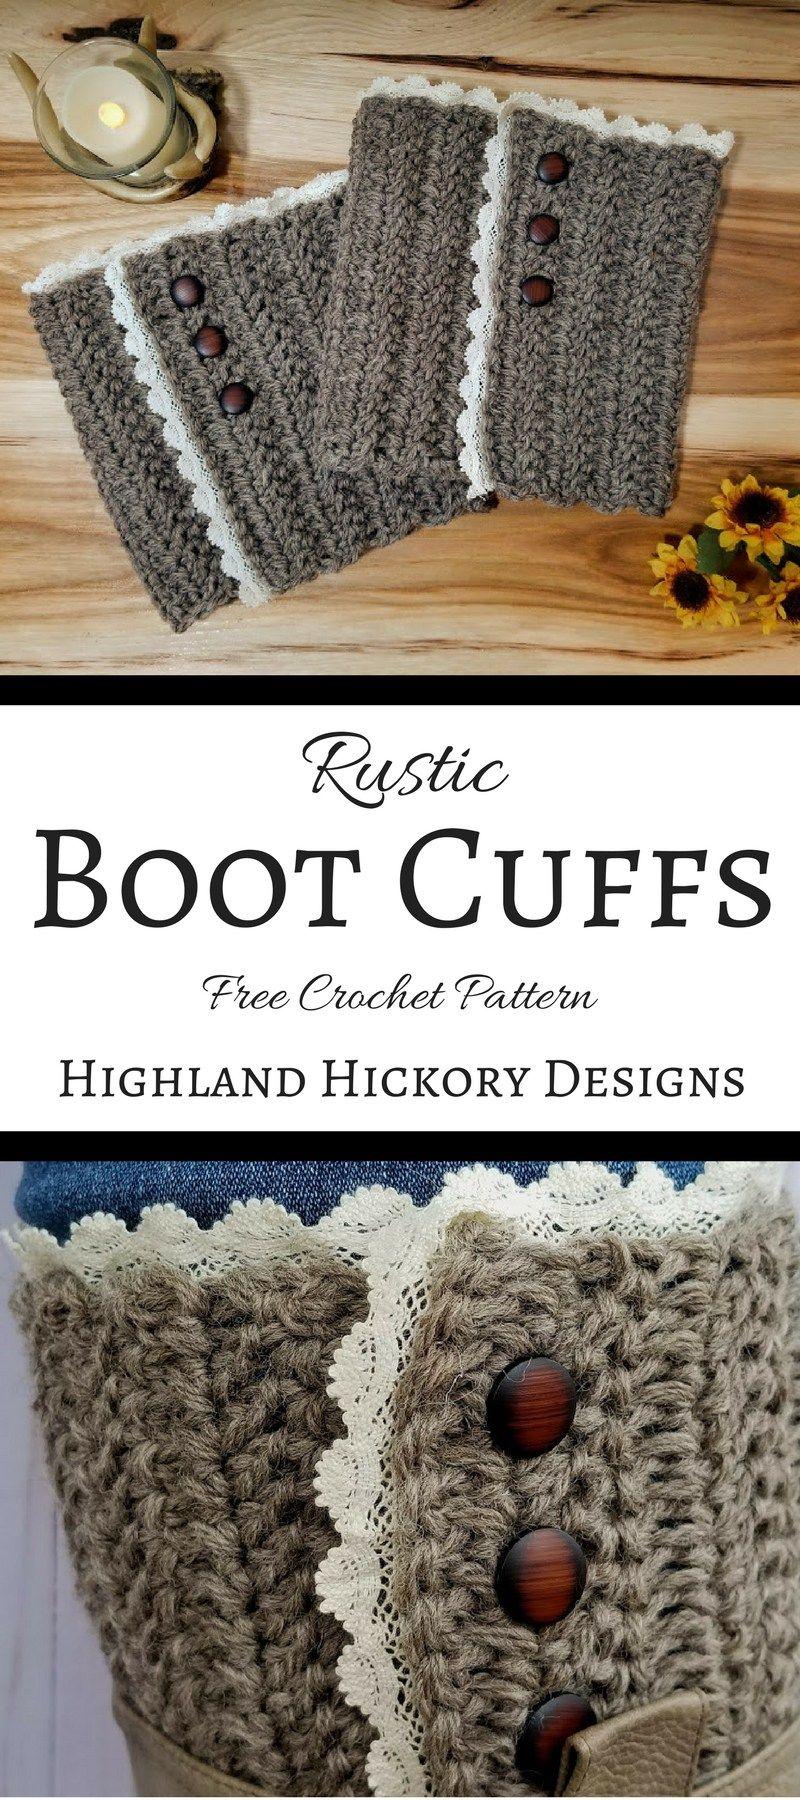 Rustic Boot Cuffs - Free Crochet Pattern | Crochet | Pinterest ...